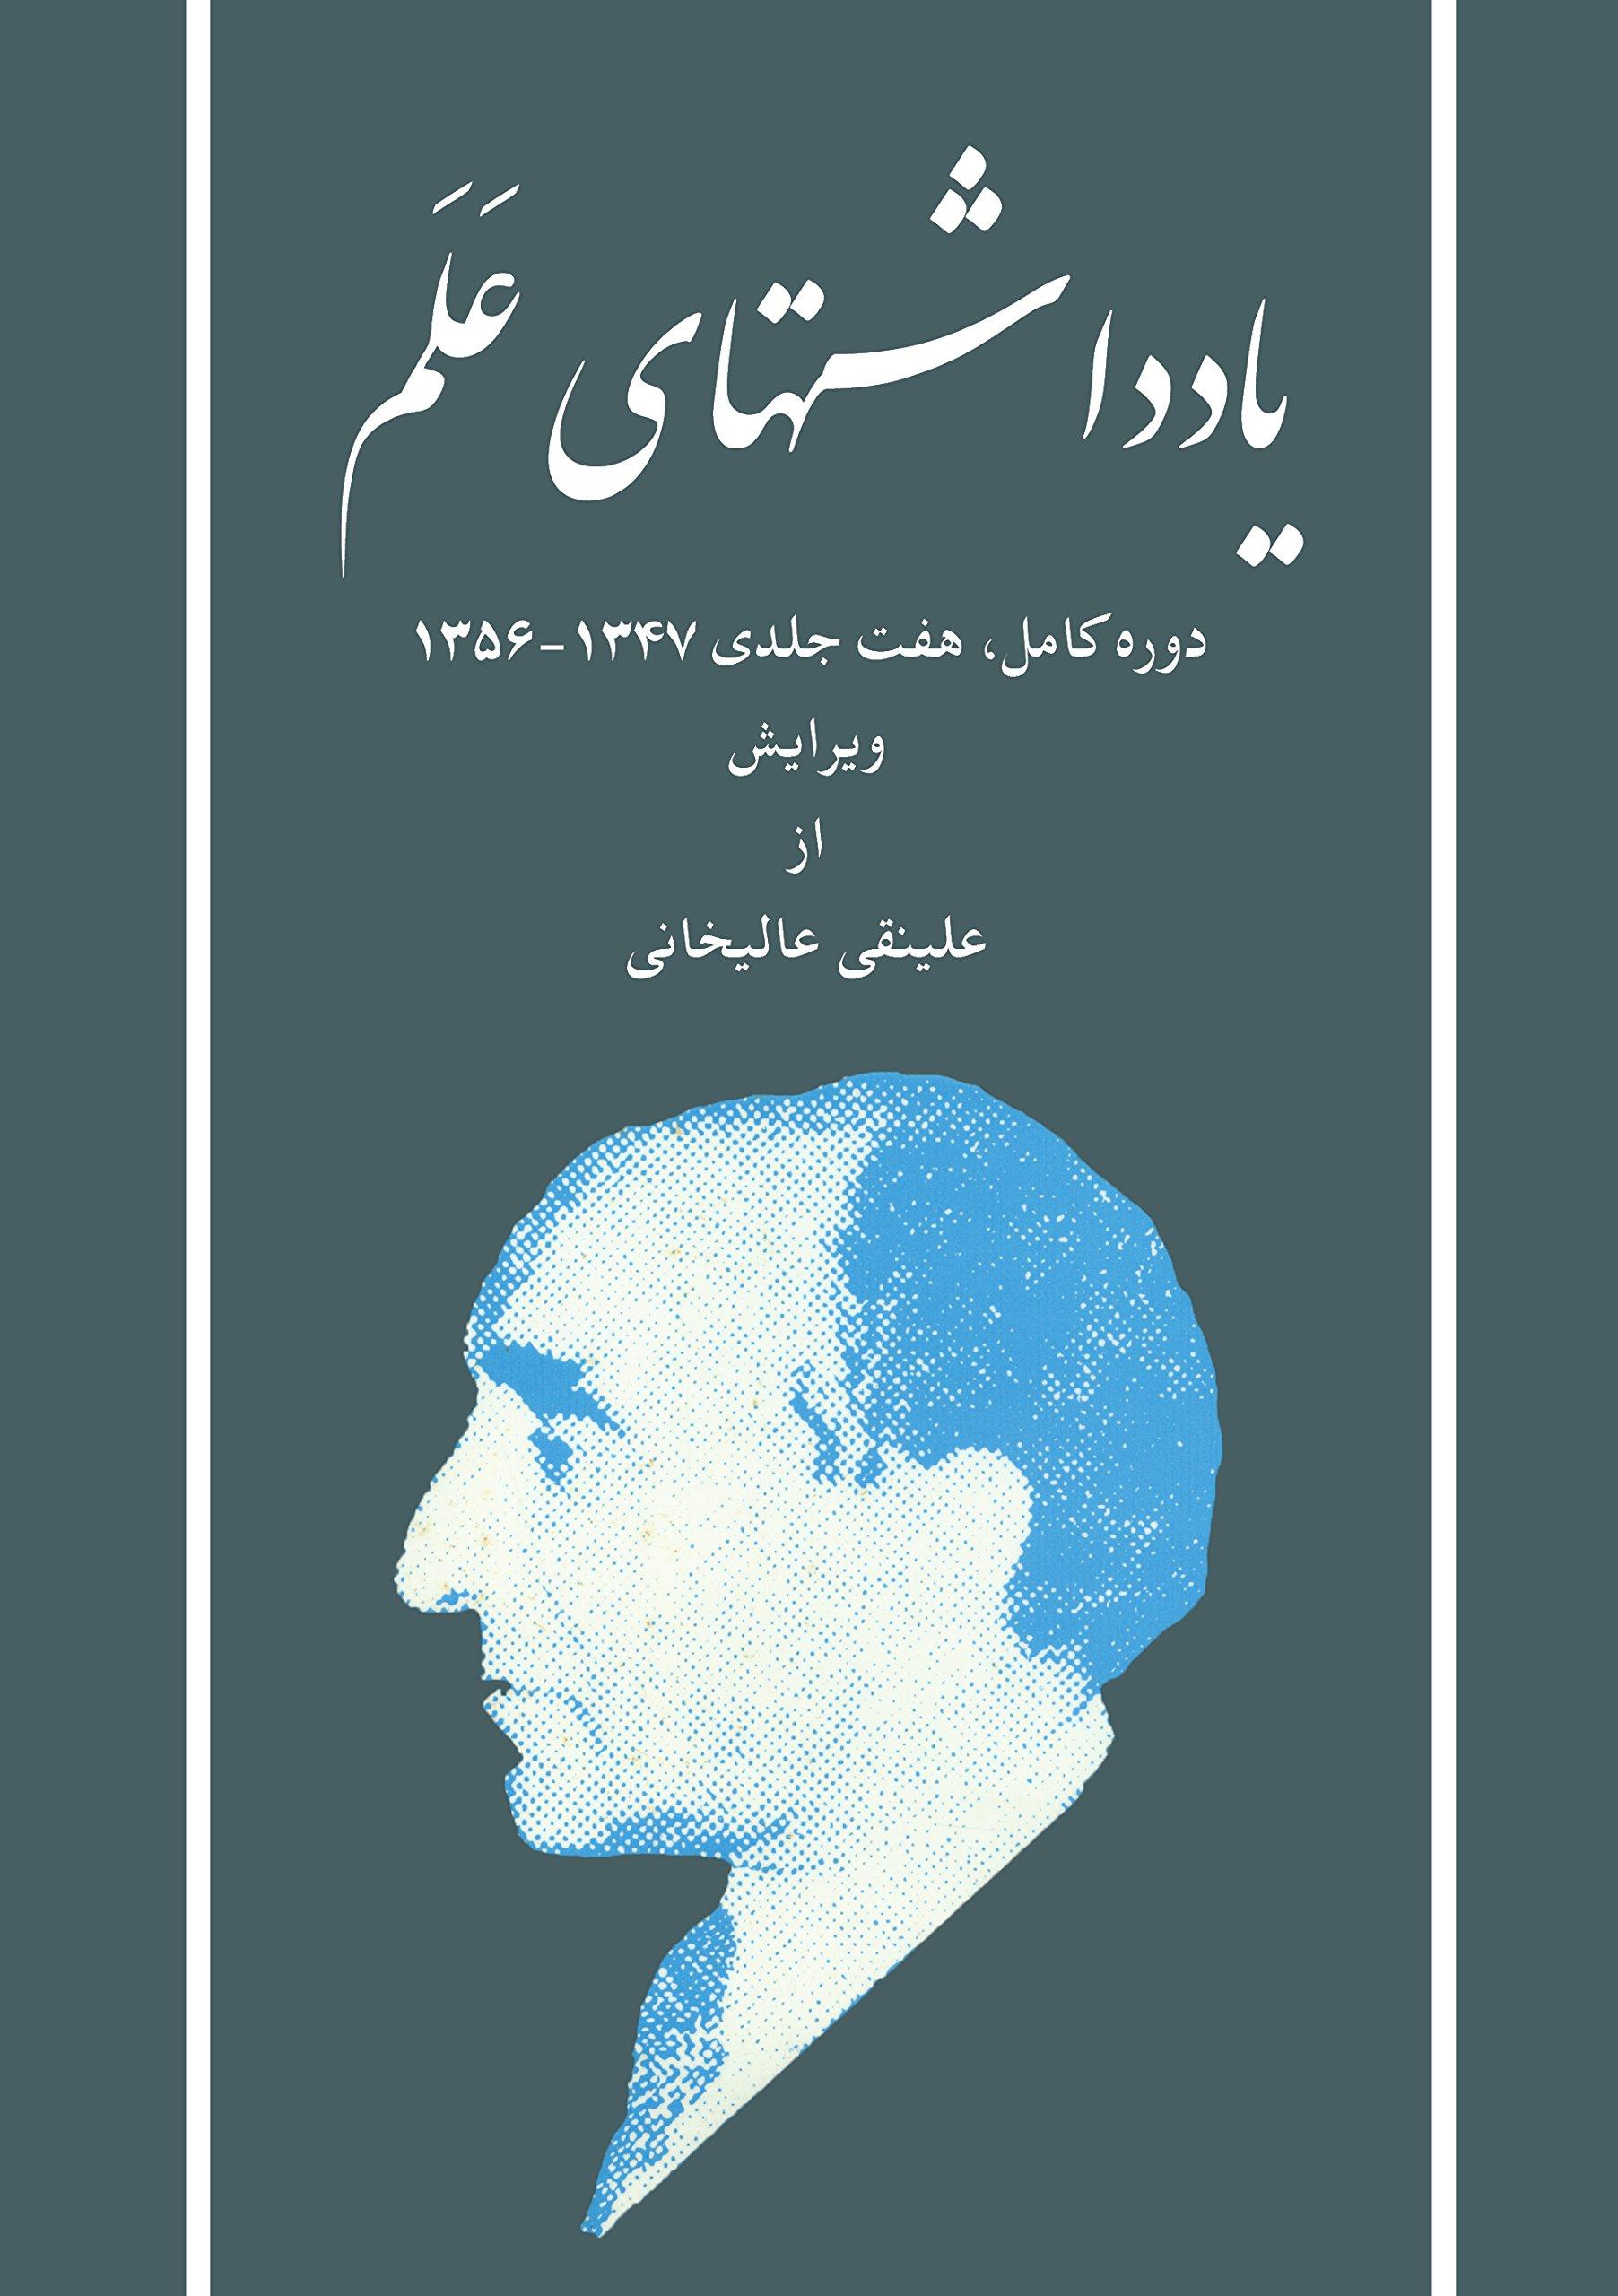 Diaries of Assadollah Alam: Seven Volume Set, 1346-1356/1967-1977 (Persian/Farsi language) (Alam Diaries) (Farsi Edition) (Persian Edition) by Ibex Publishers